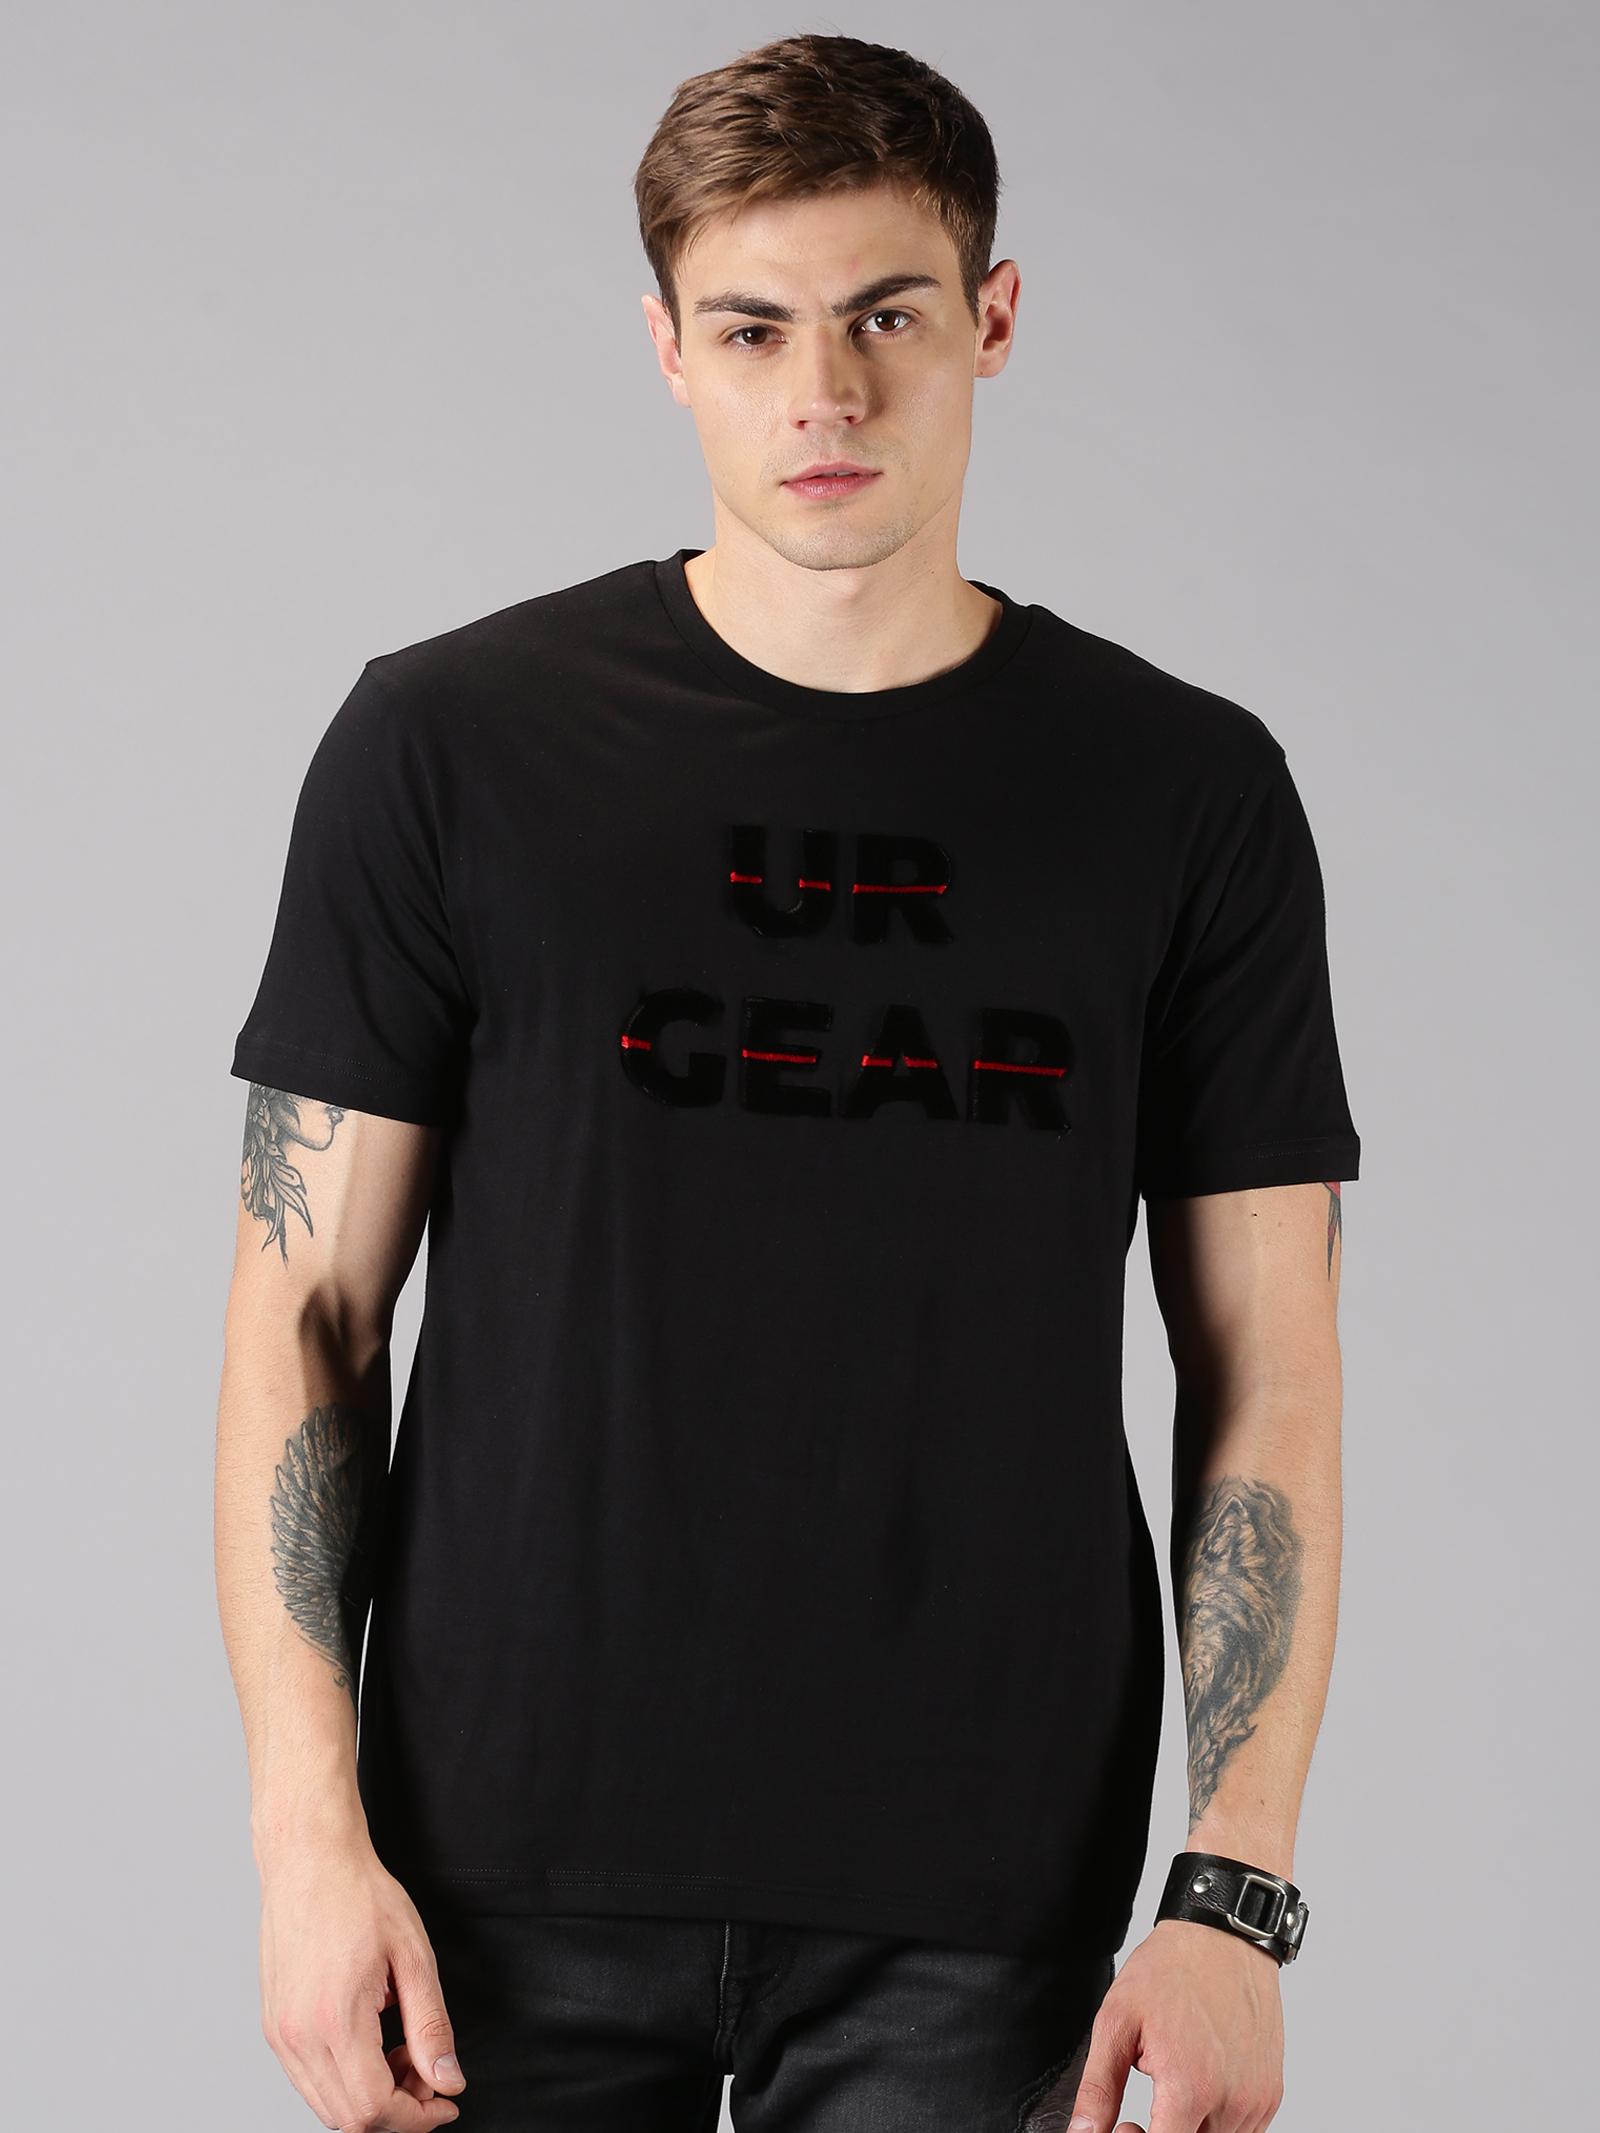 UrGear | UrGear Tuft Embro Men Round Neck Black  T-Shirt